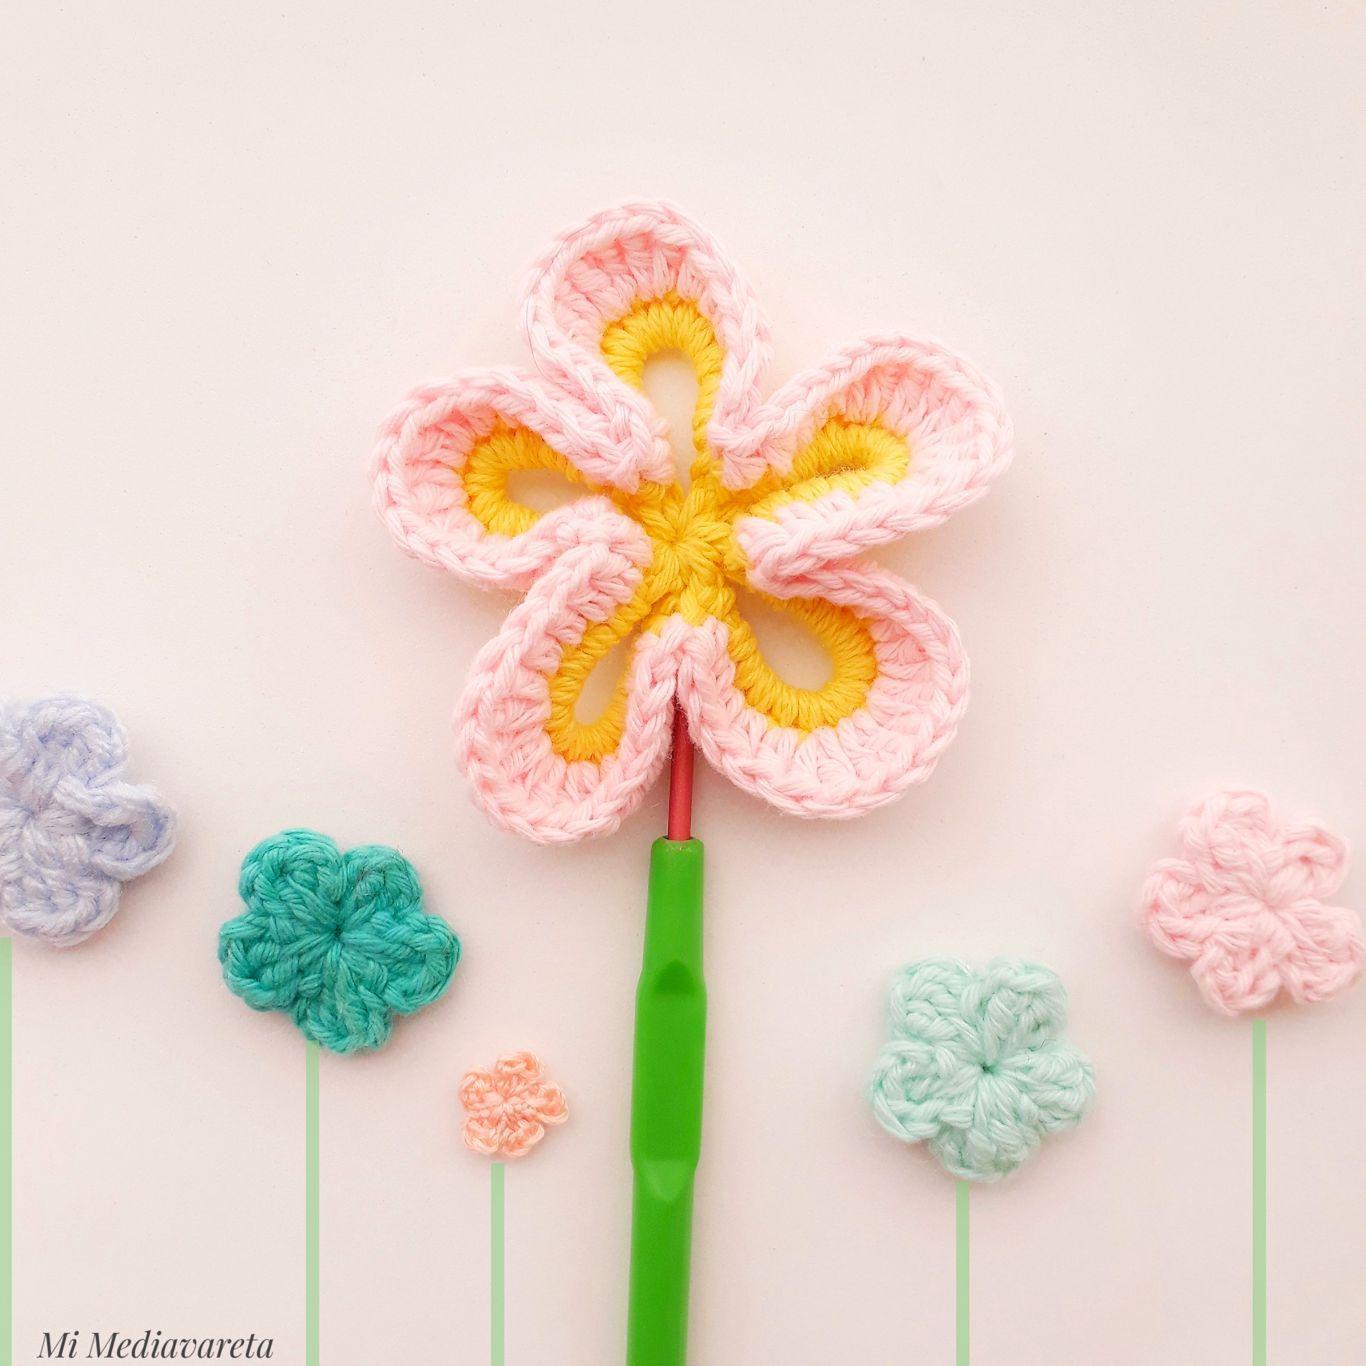 aprende a tejer flores a crochet con este tutorial paso a paso